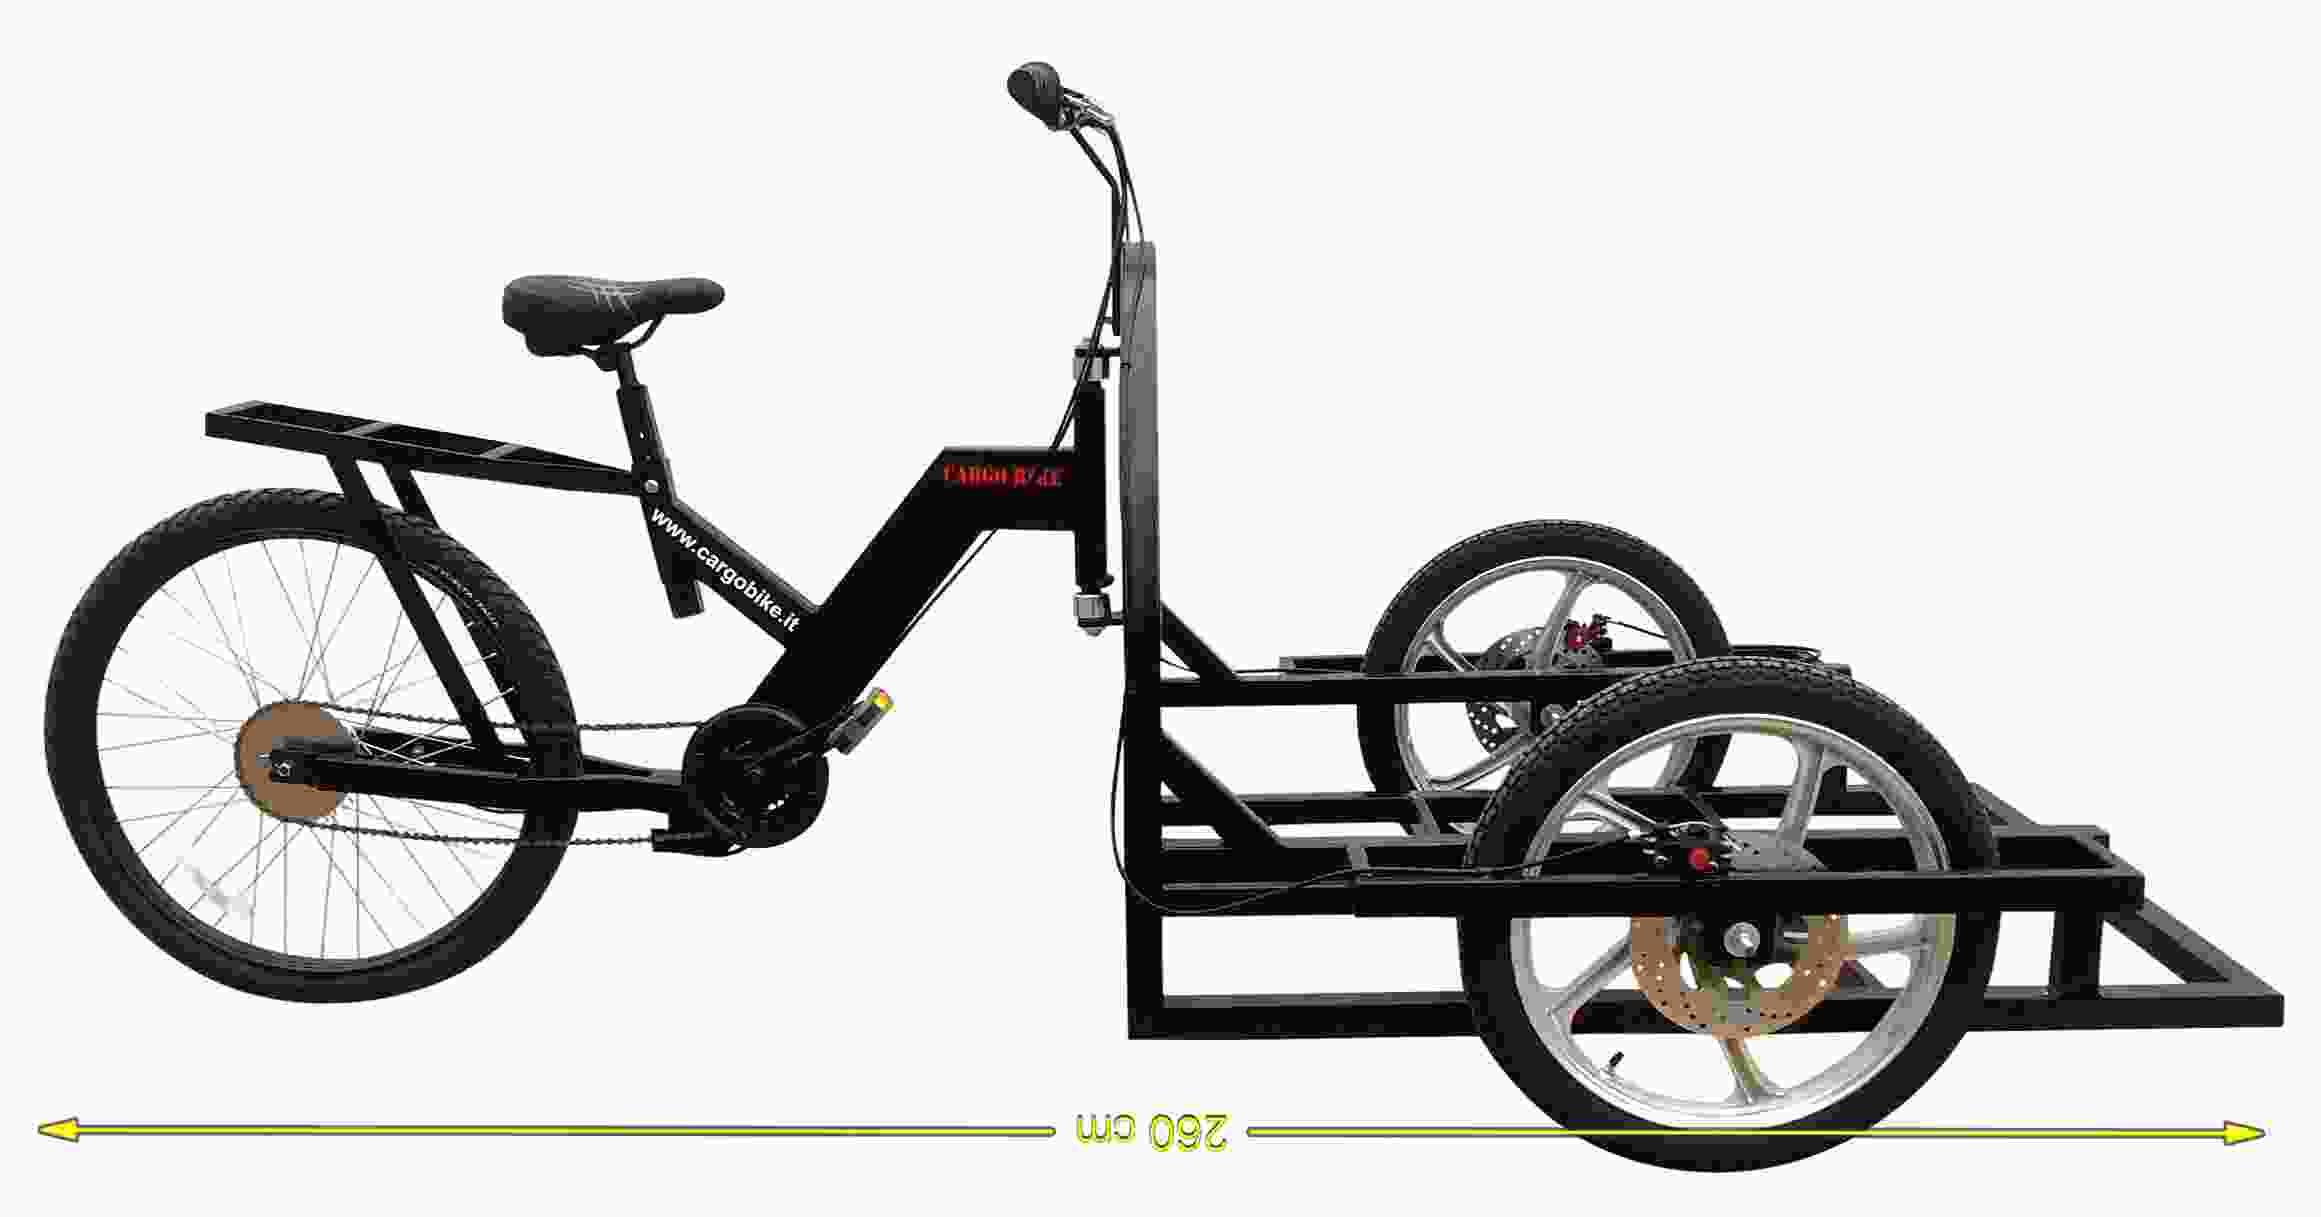 Attila Work Tricycle Bike Cargo Heavy Duty To Built Carts